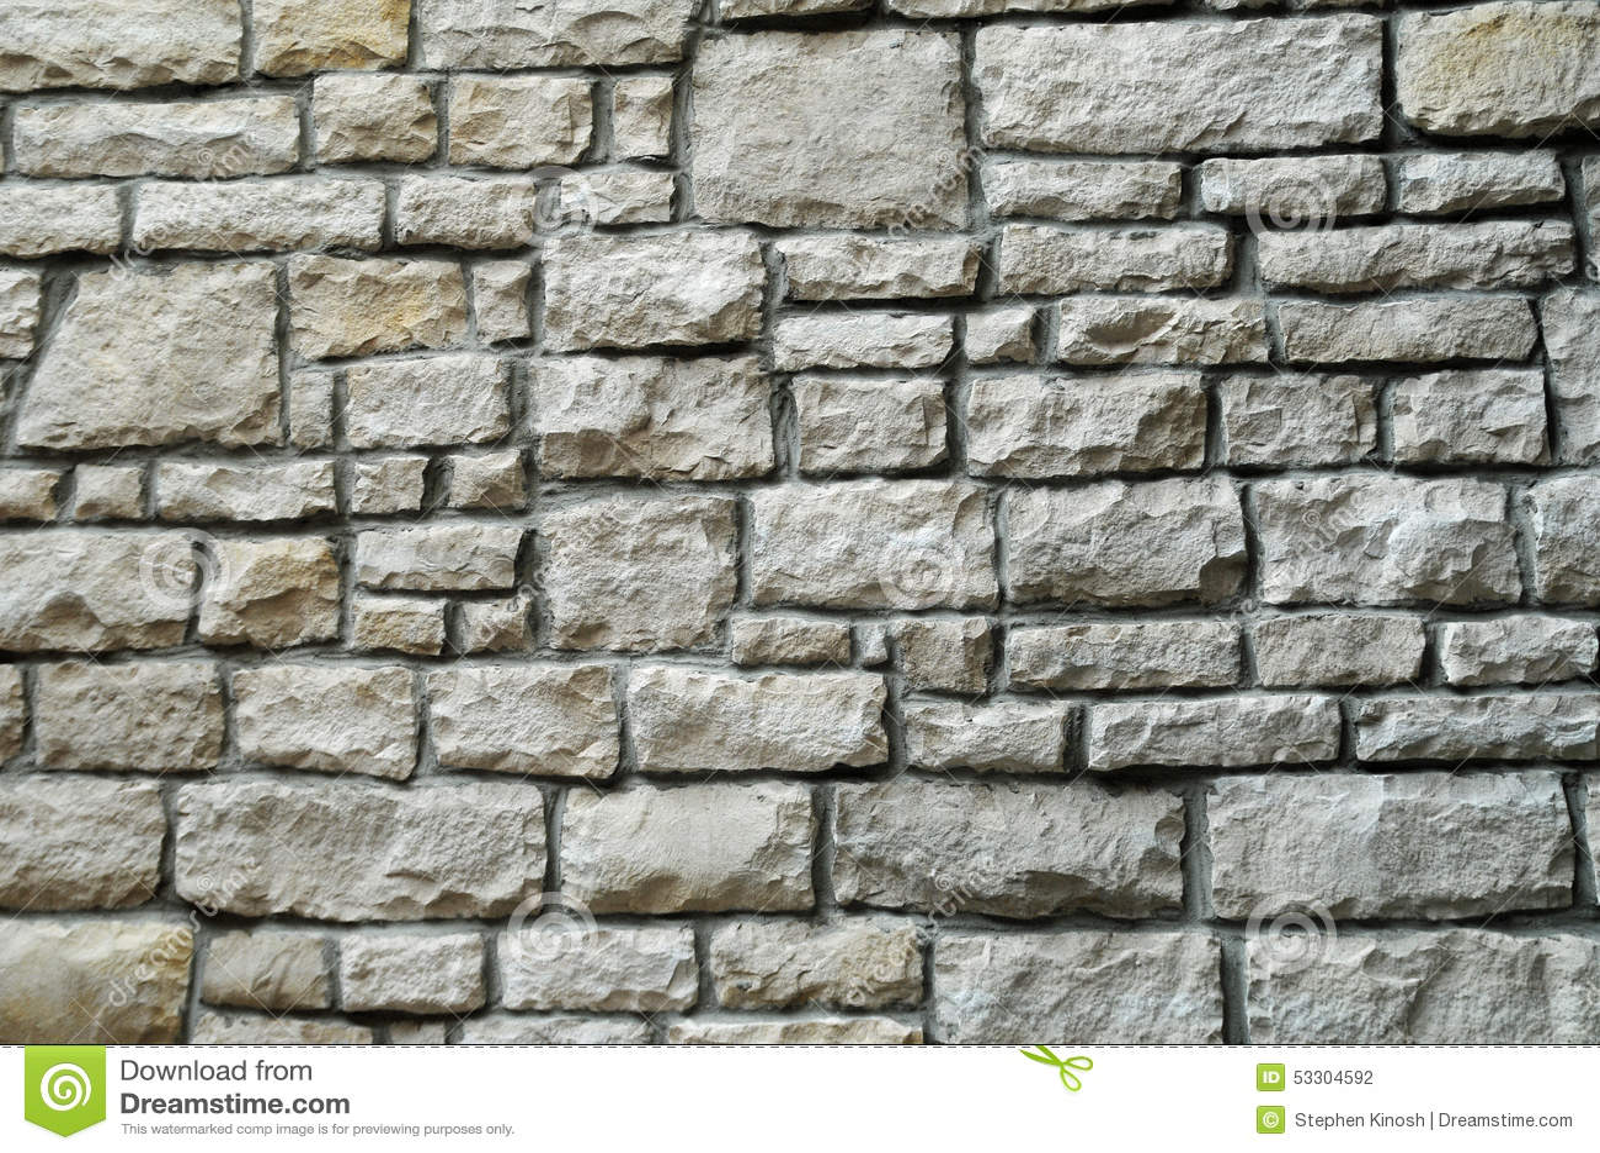 Stone Block Wall Terraria : Stone block wall stock photo image